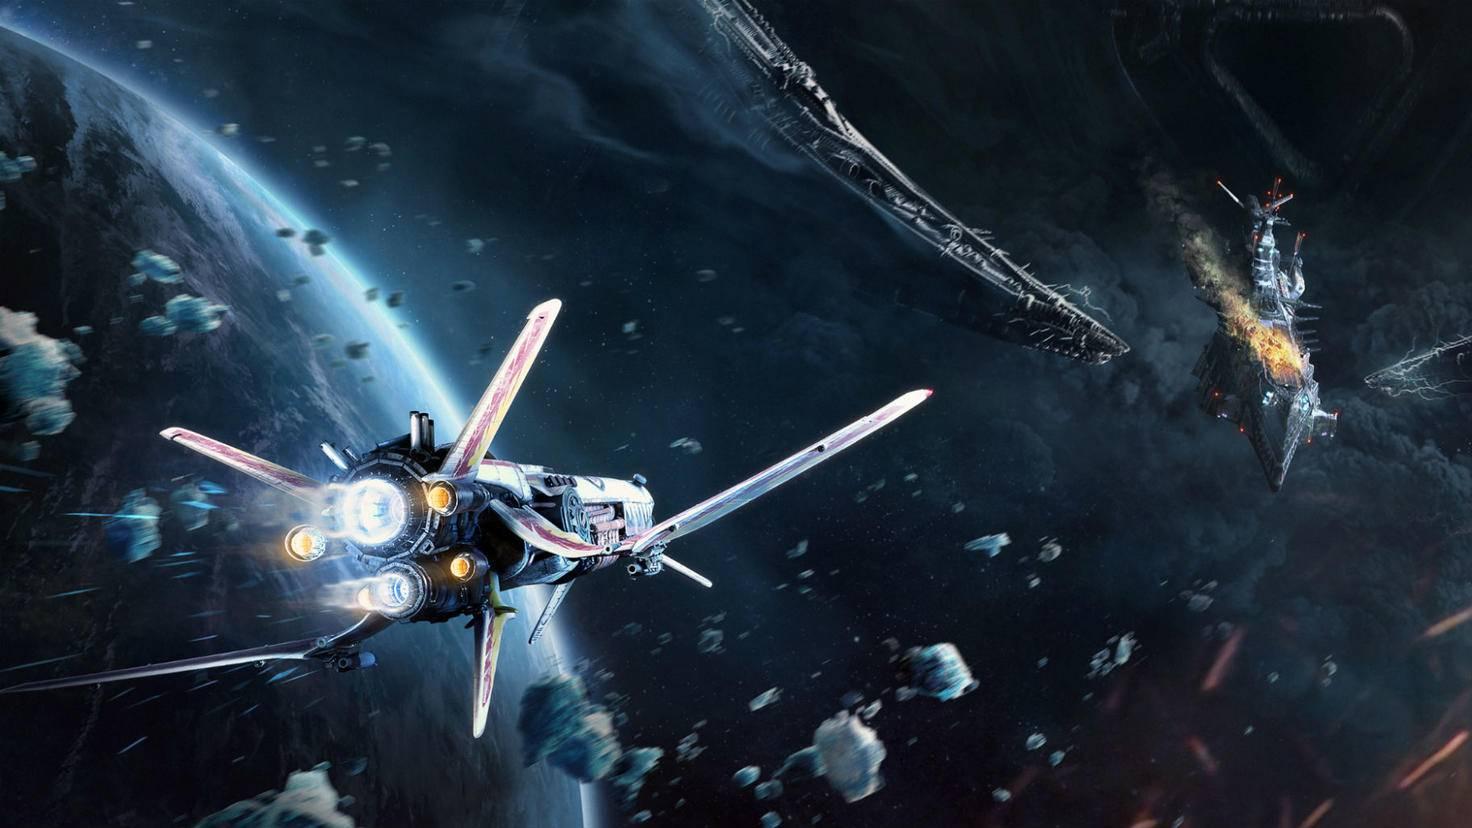 beyond-good-and-evil-2-artwork-spaceship